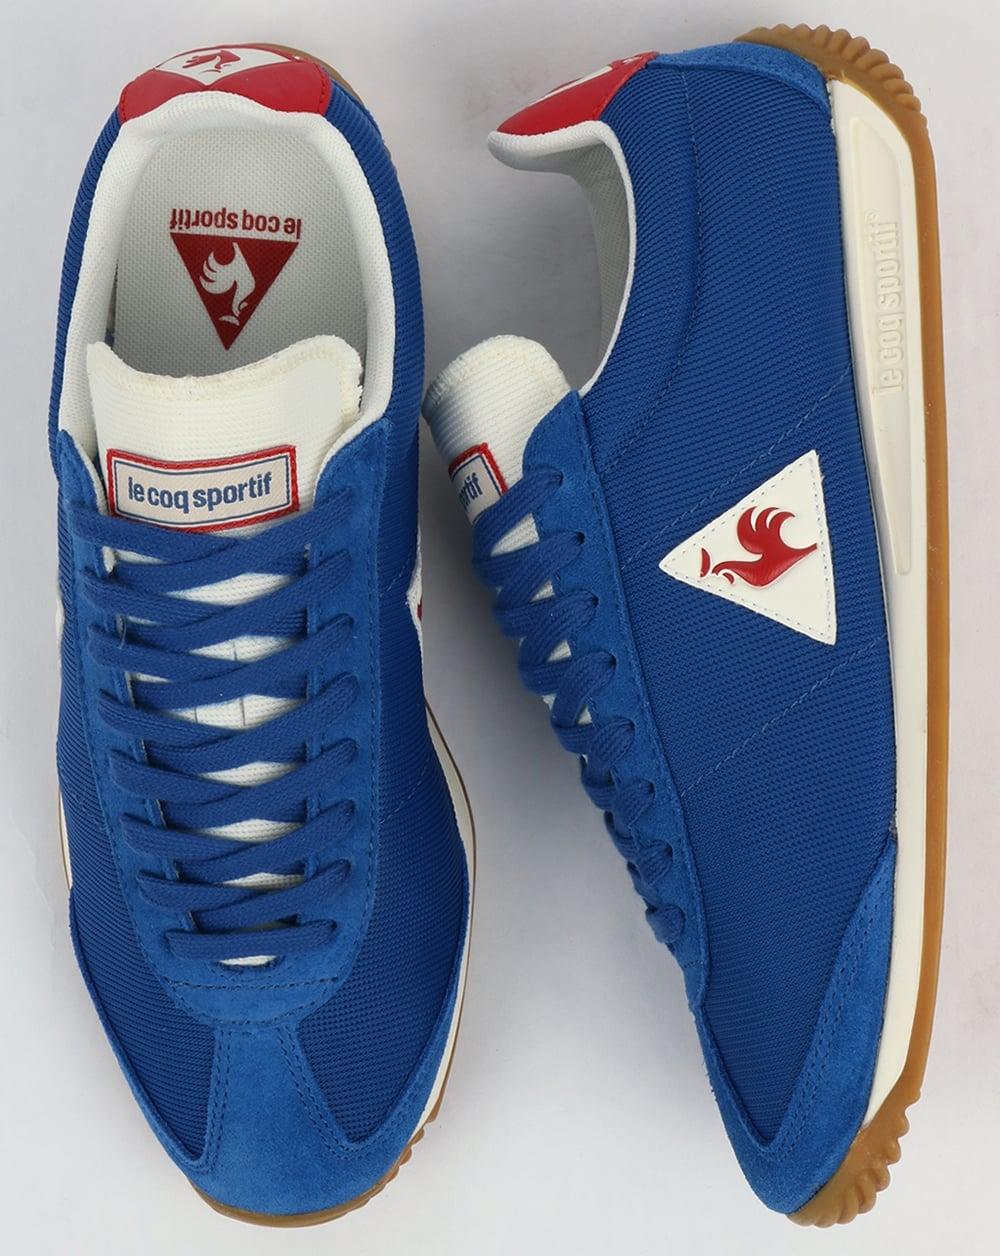 Sportif Sportif Sportif shoes Le Gum Coq Royal Blue Quartz Trainers 0q0r5n